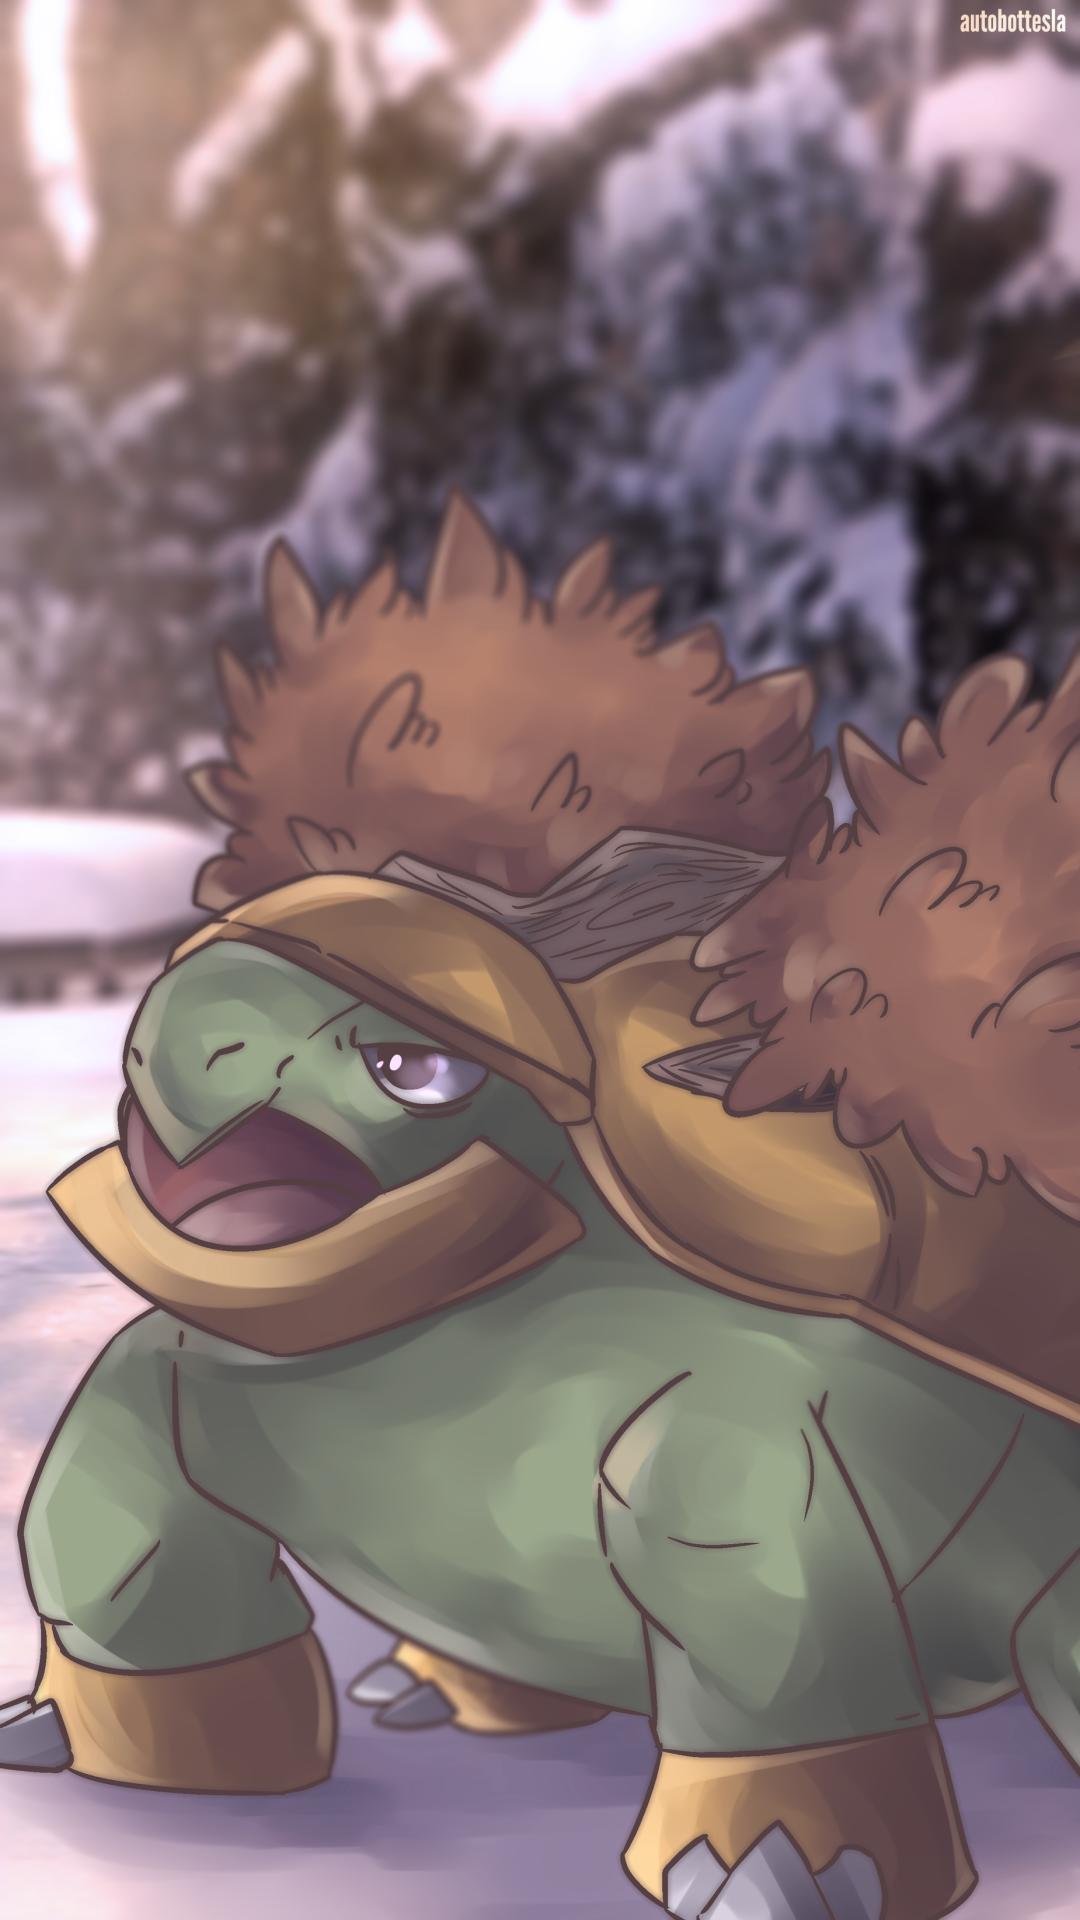 Grotle | Cuteness & Pokemon | Pinterest | Pokémon